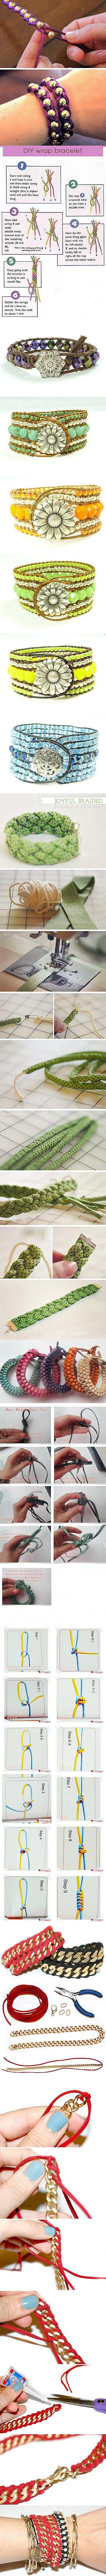 DIY bracelet tutorials! What a comprehensive list with great photos!